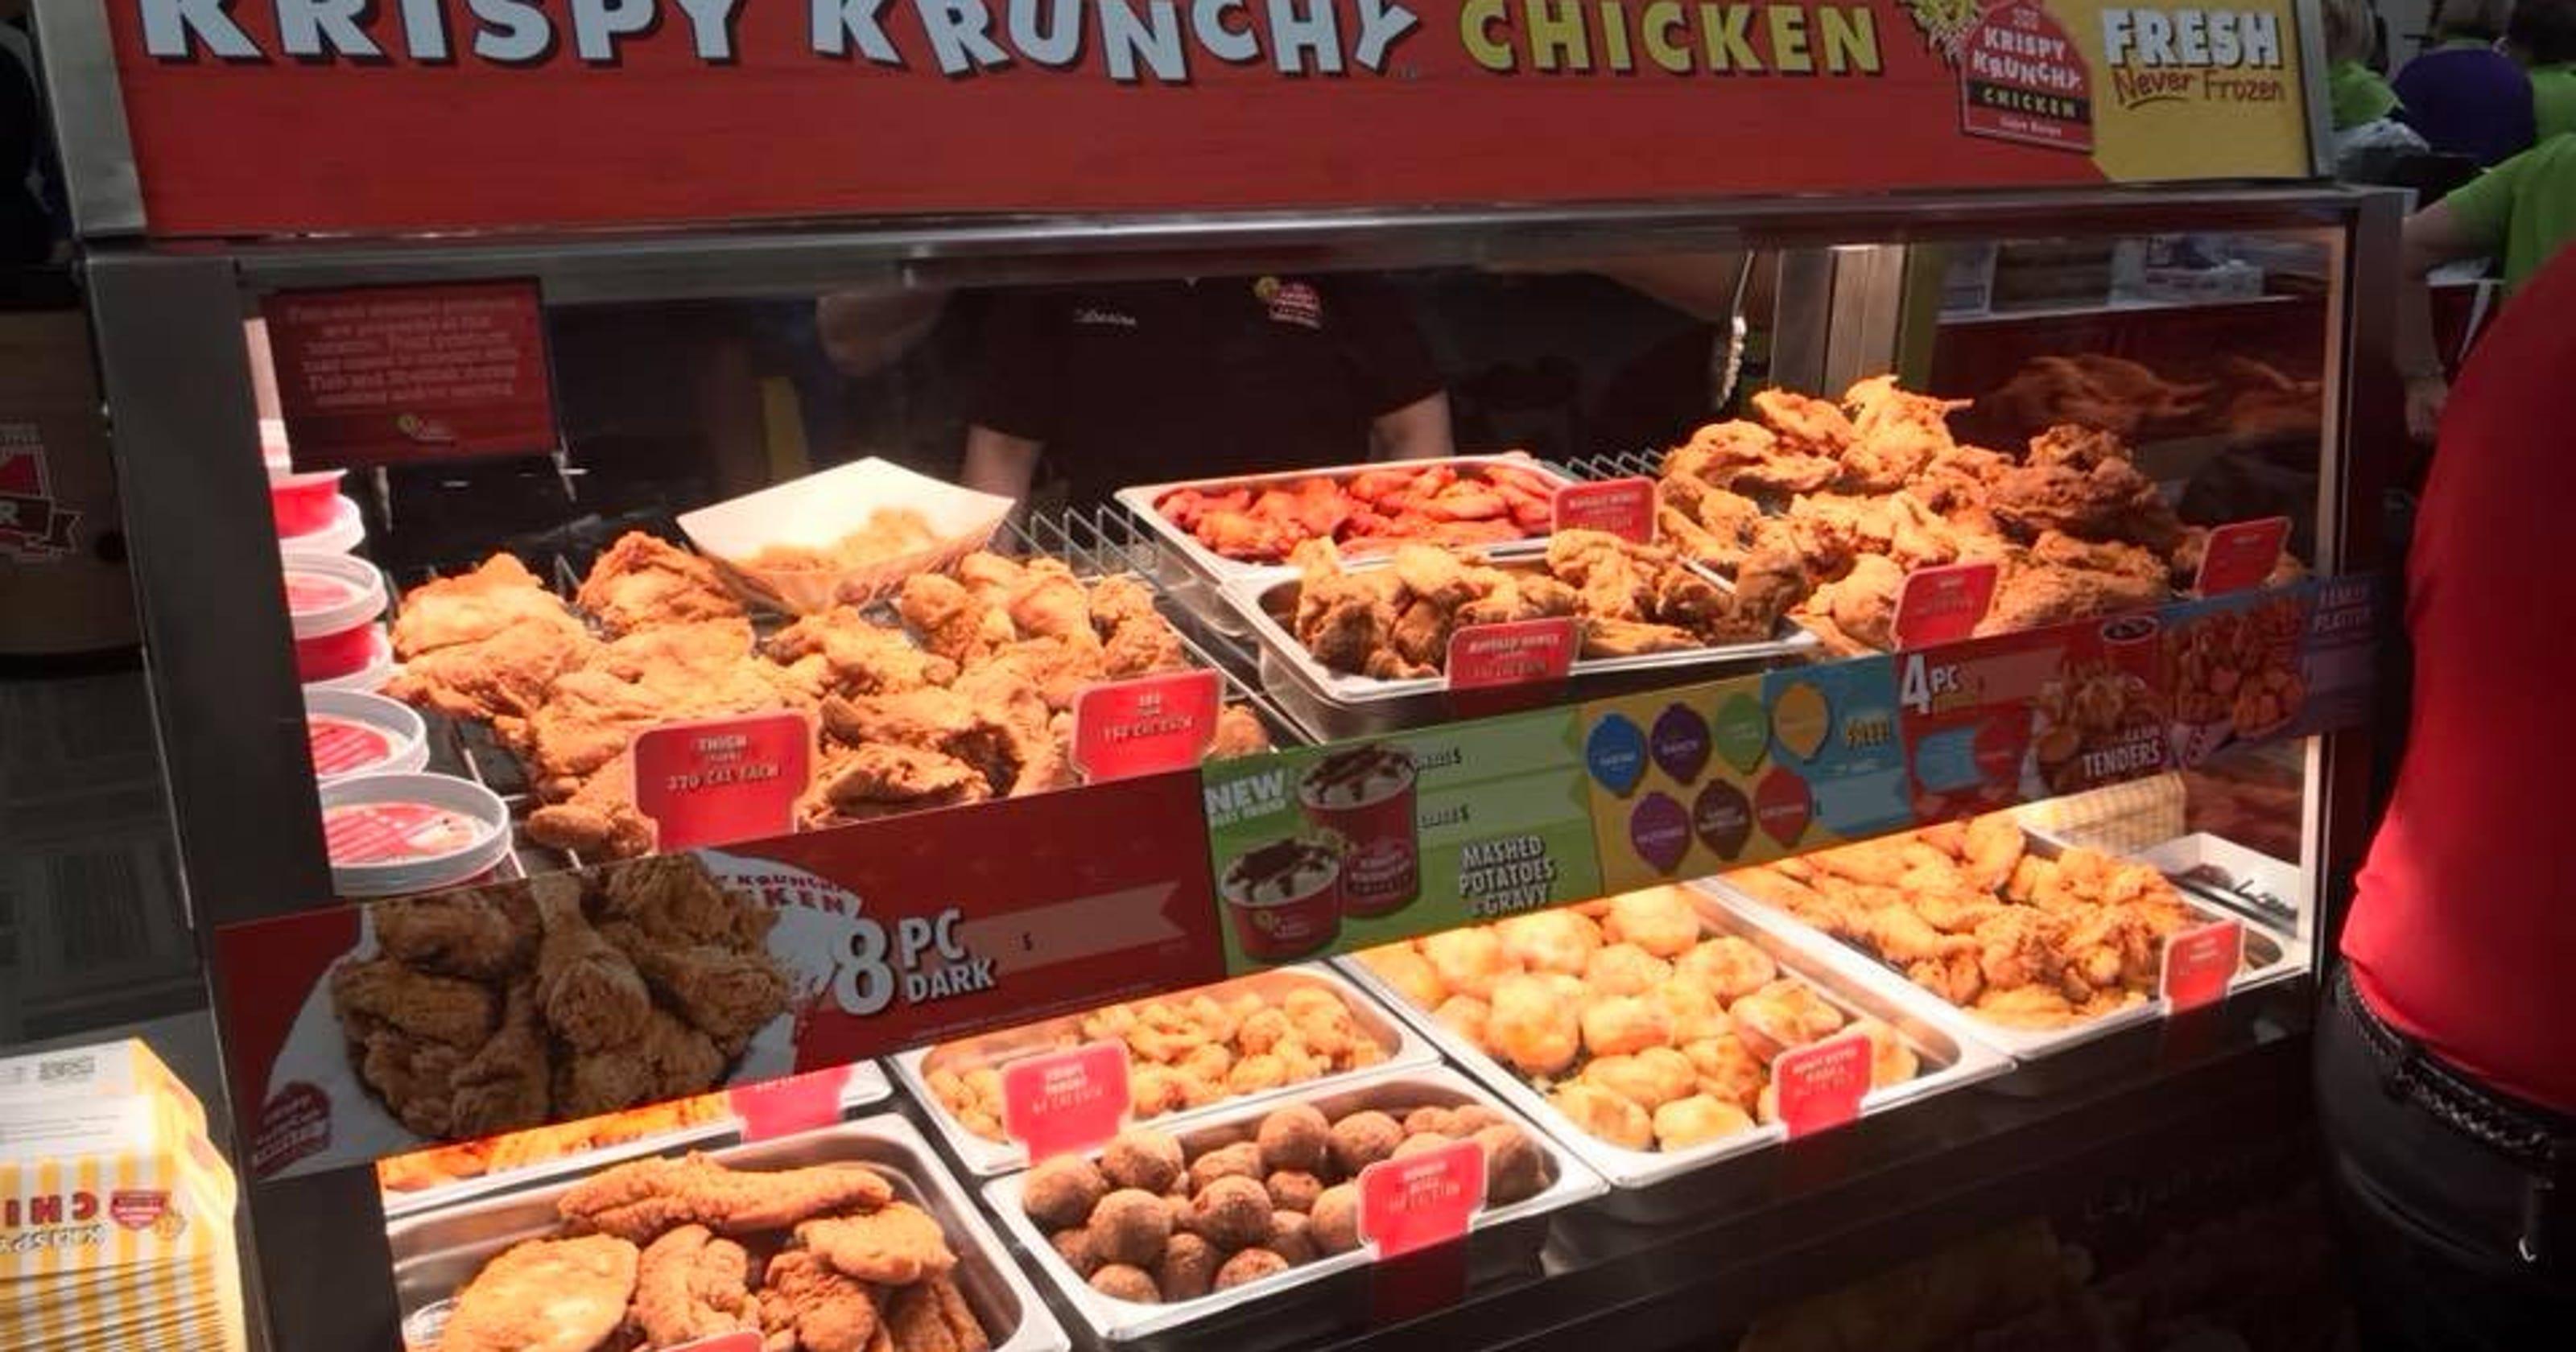 Krispy Krunchy Chicken wins taste buds one fill